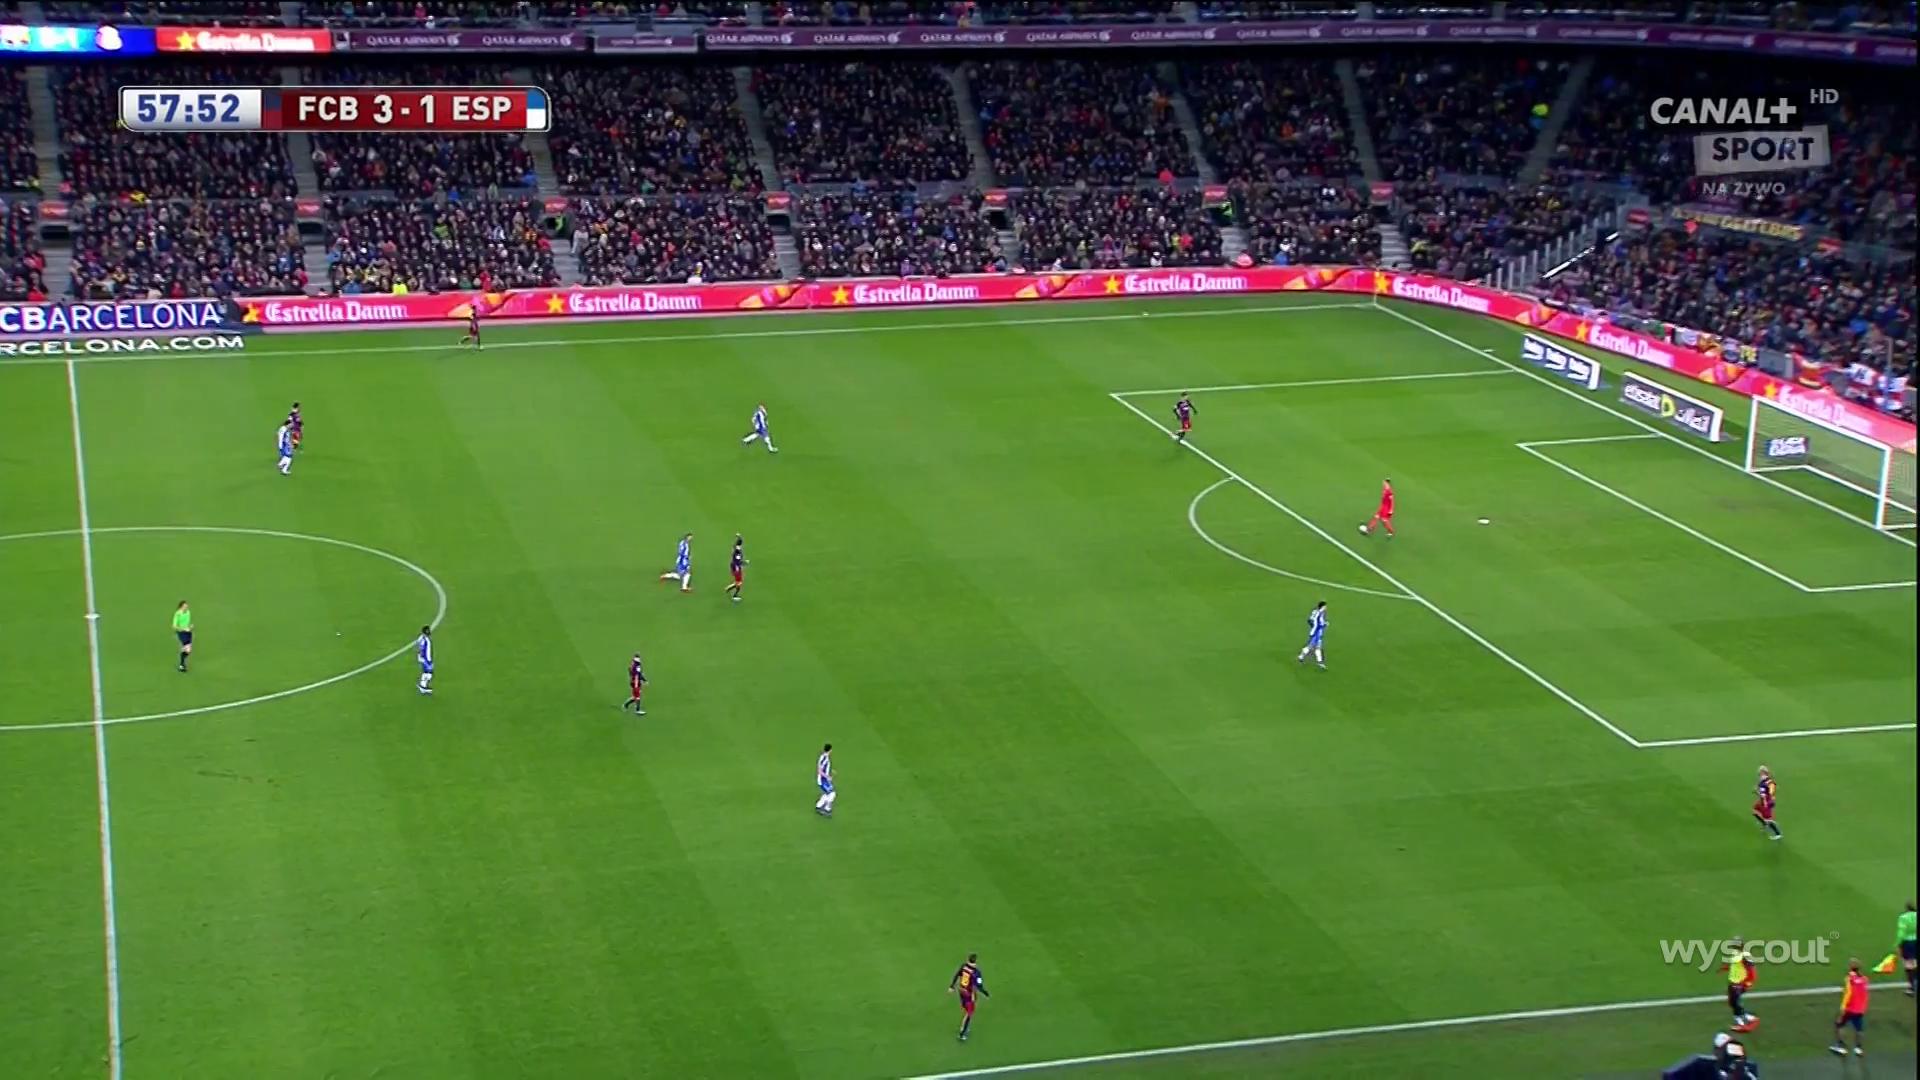 Espanyol's man-marking.